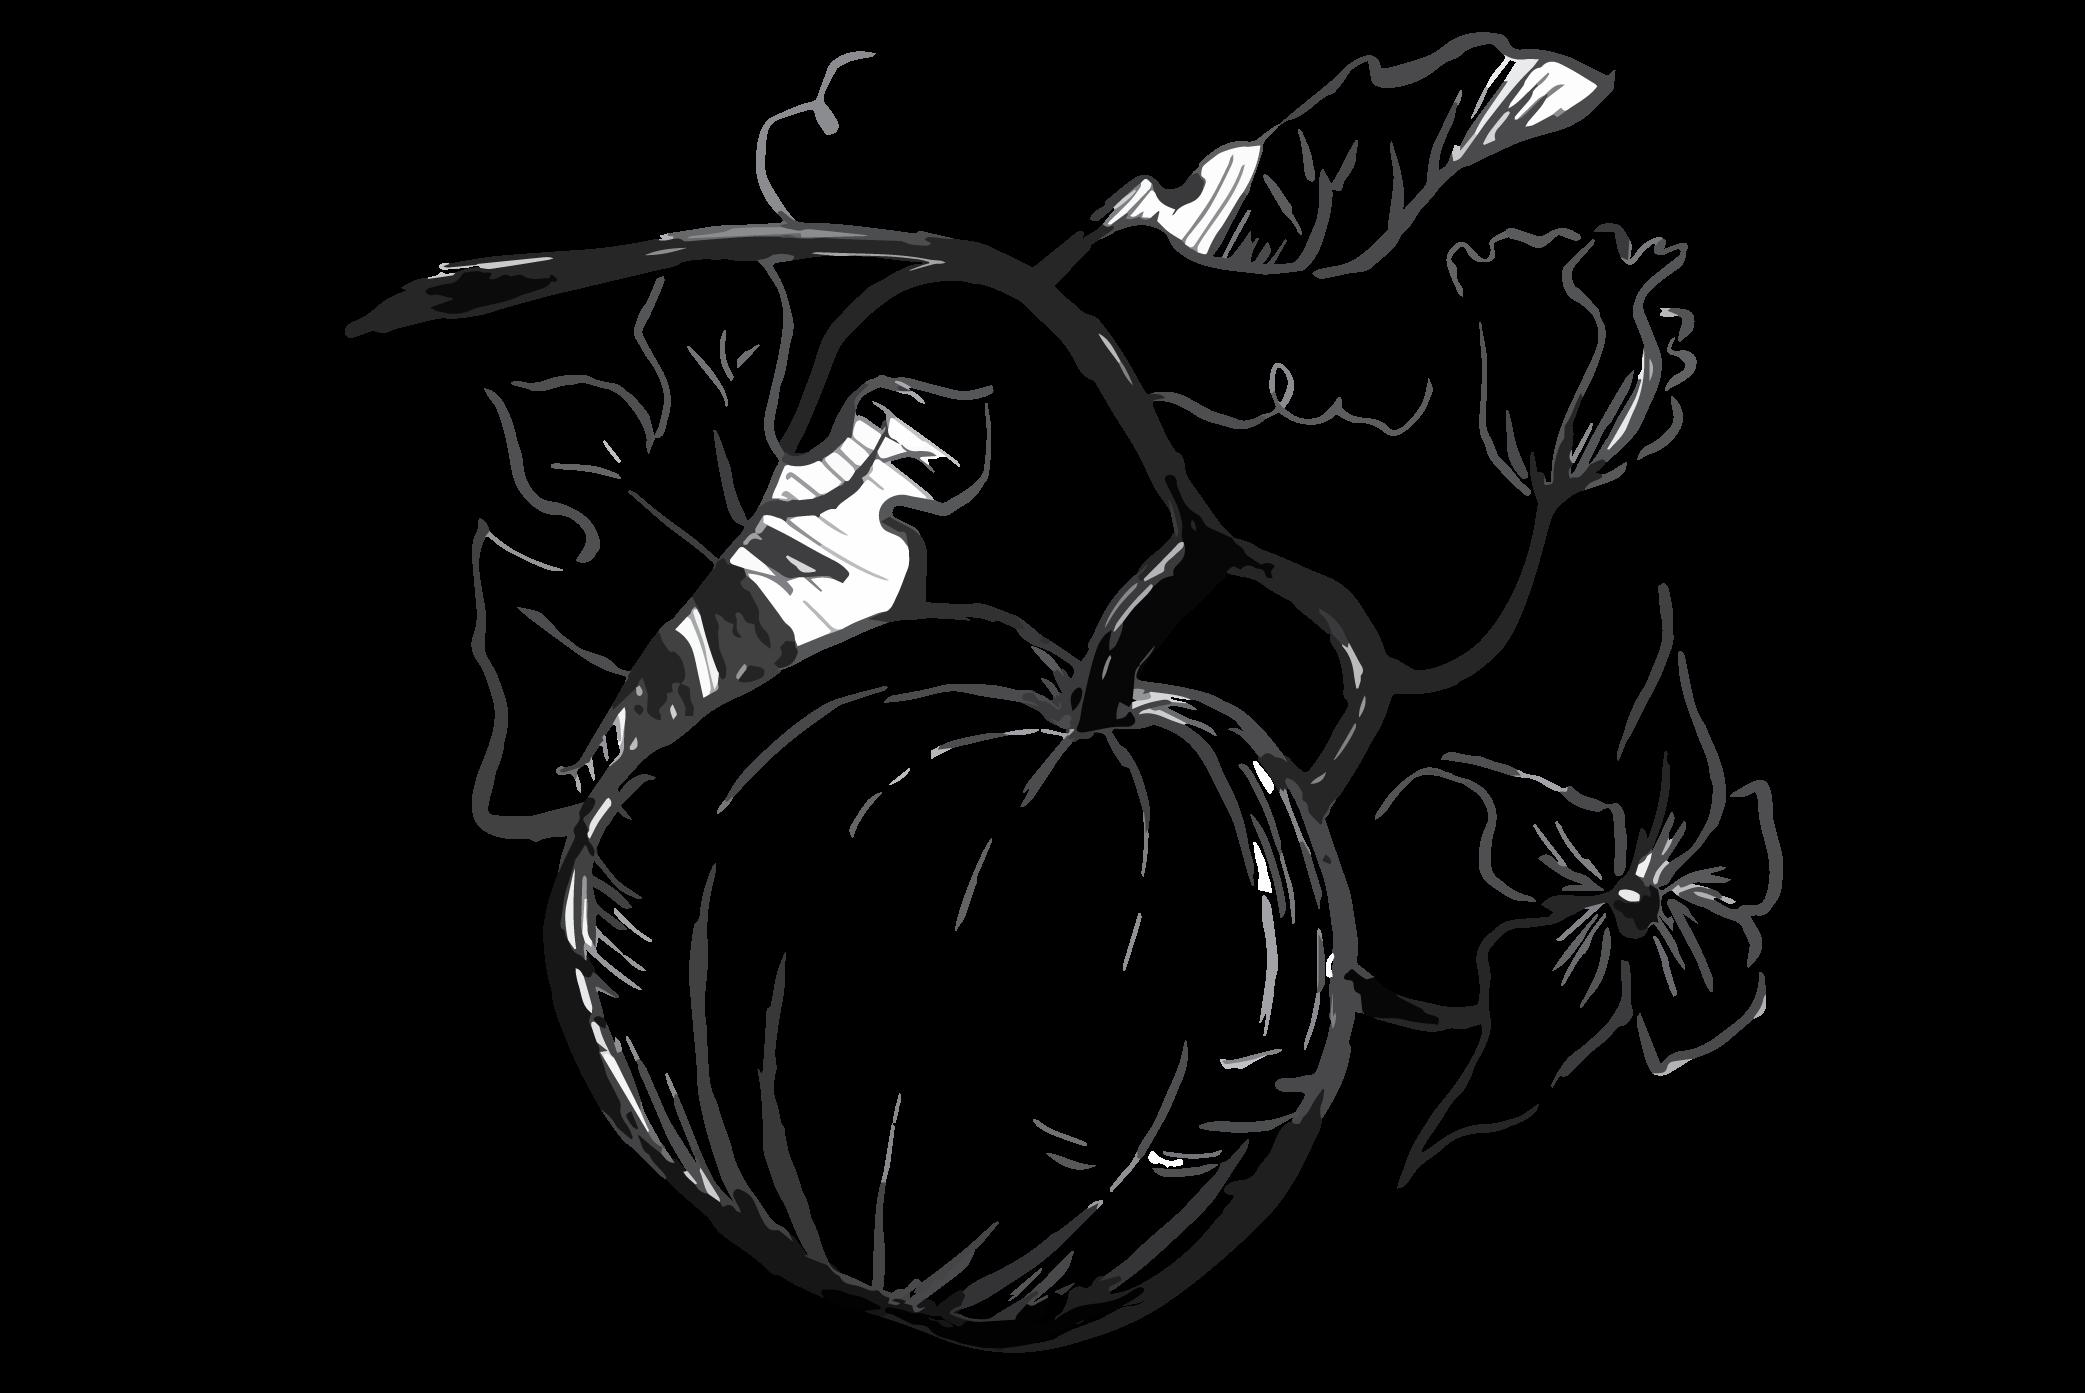 Pumpkin clipart sketch. Seed drawing at getdrawings